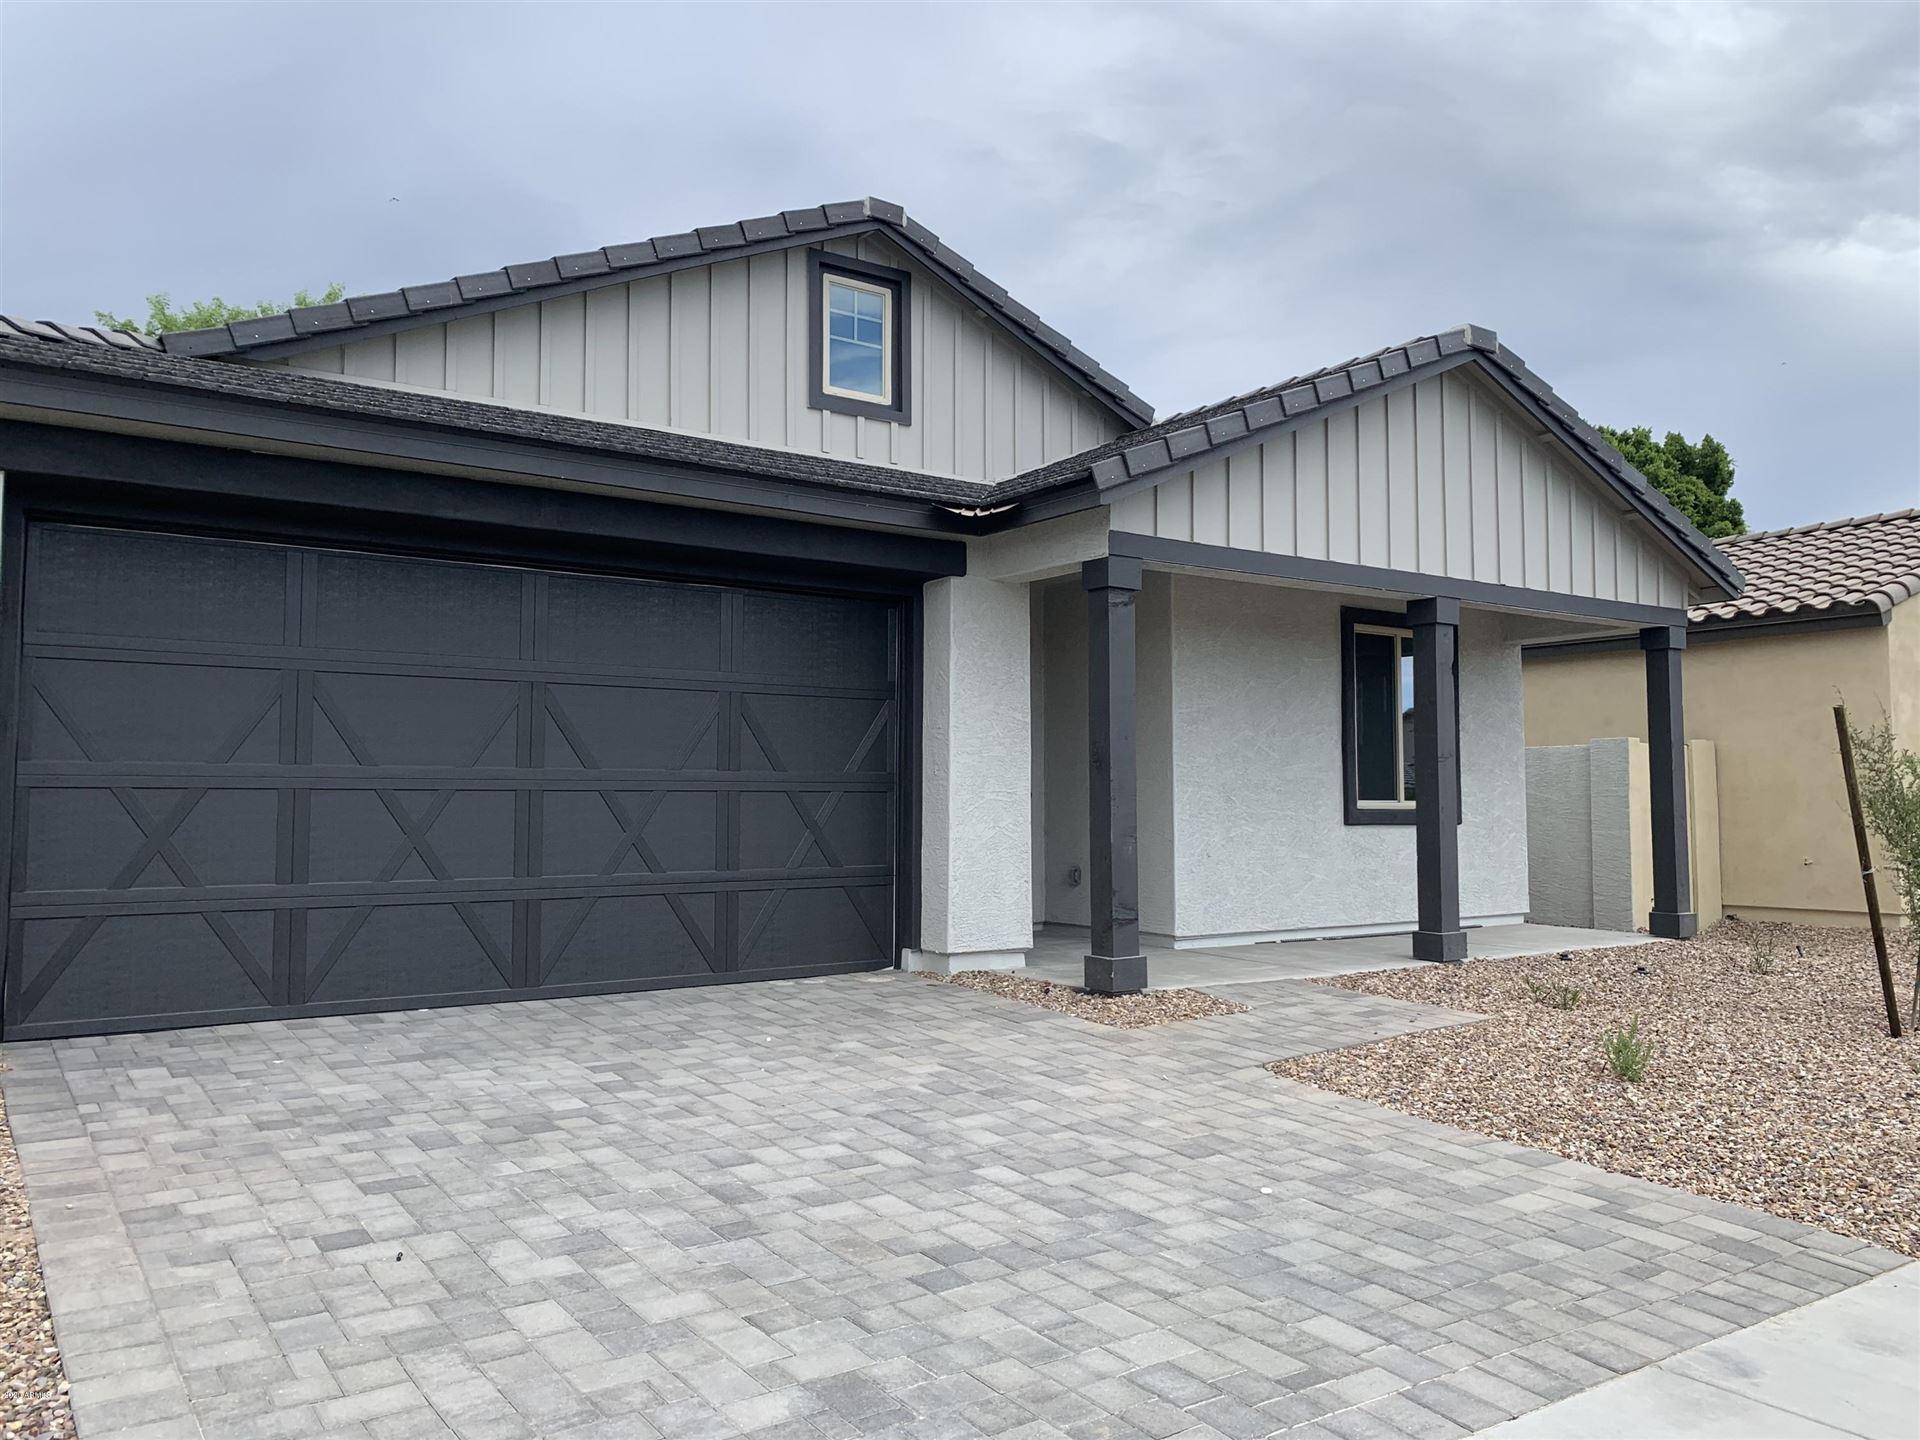 16208 S 8TH Street, Phoenix, AZ 85048 - MLS#: 6030491